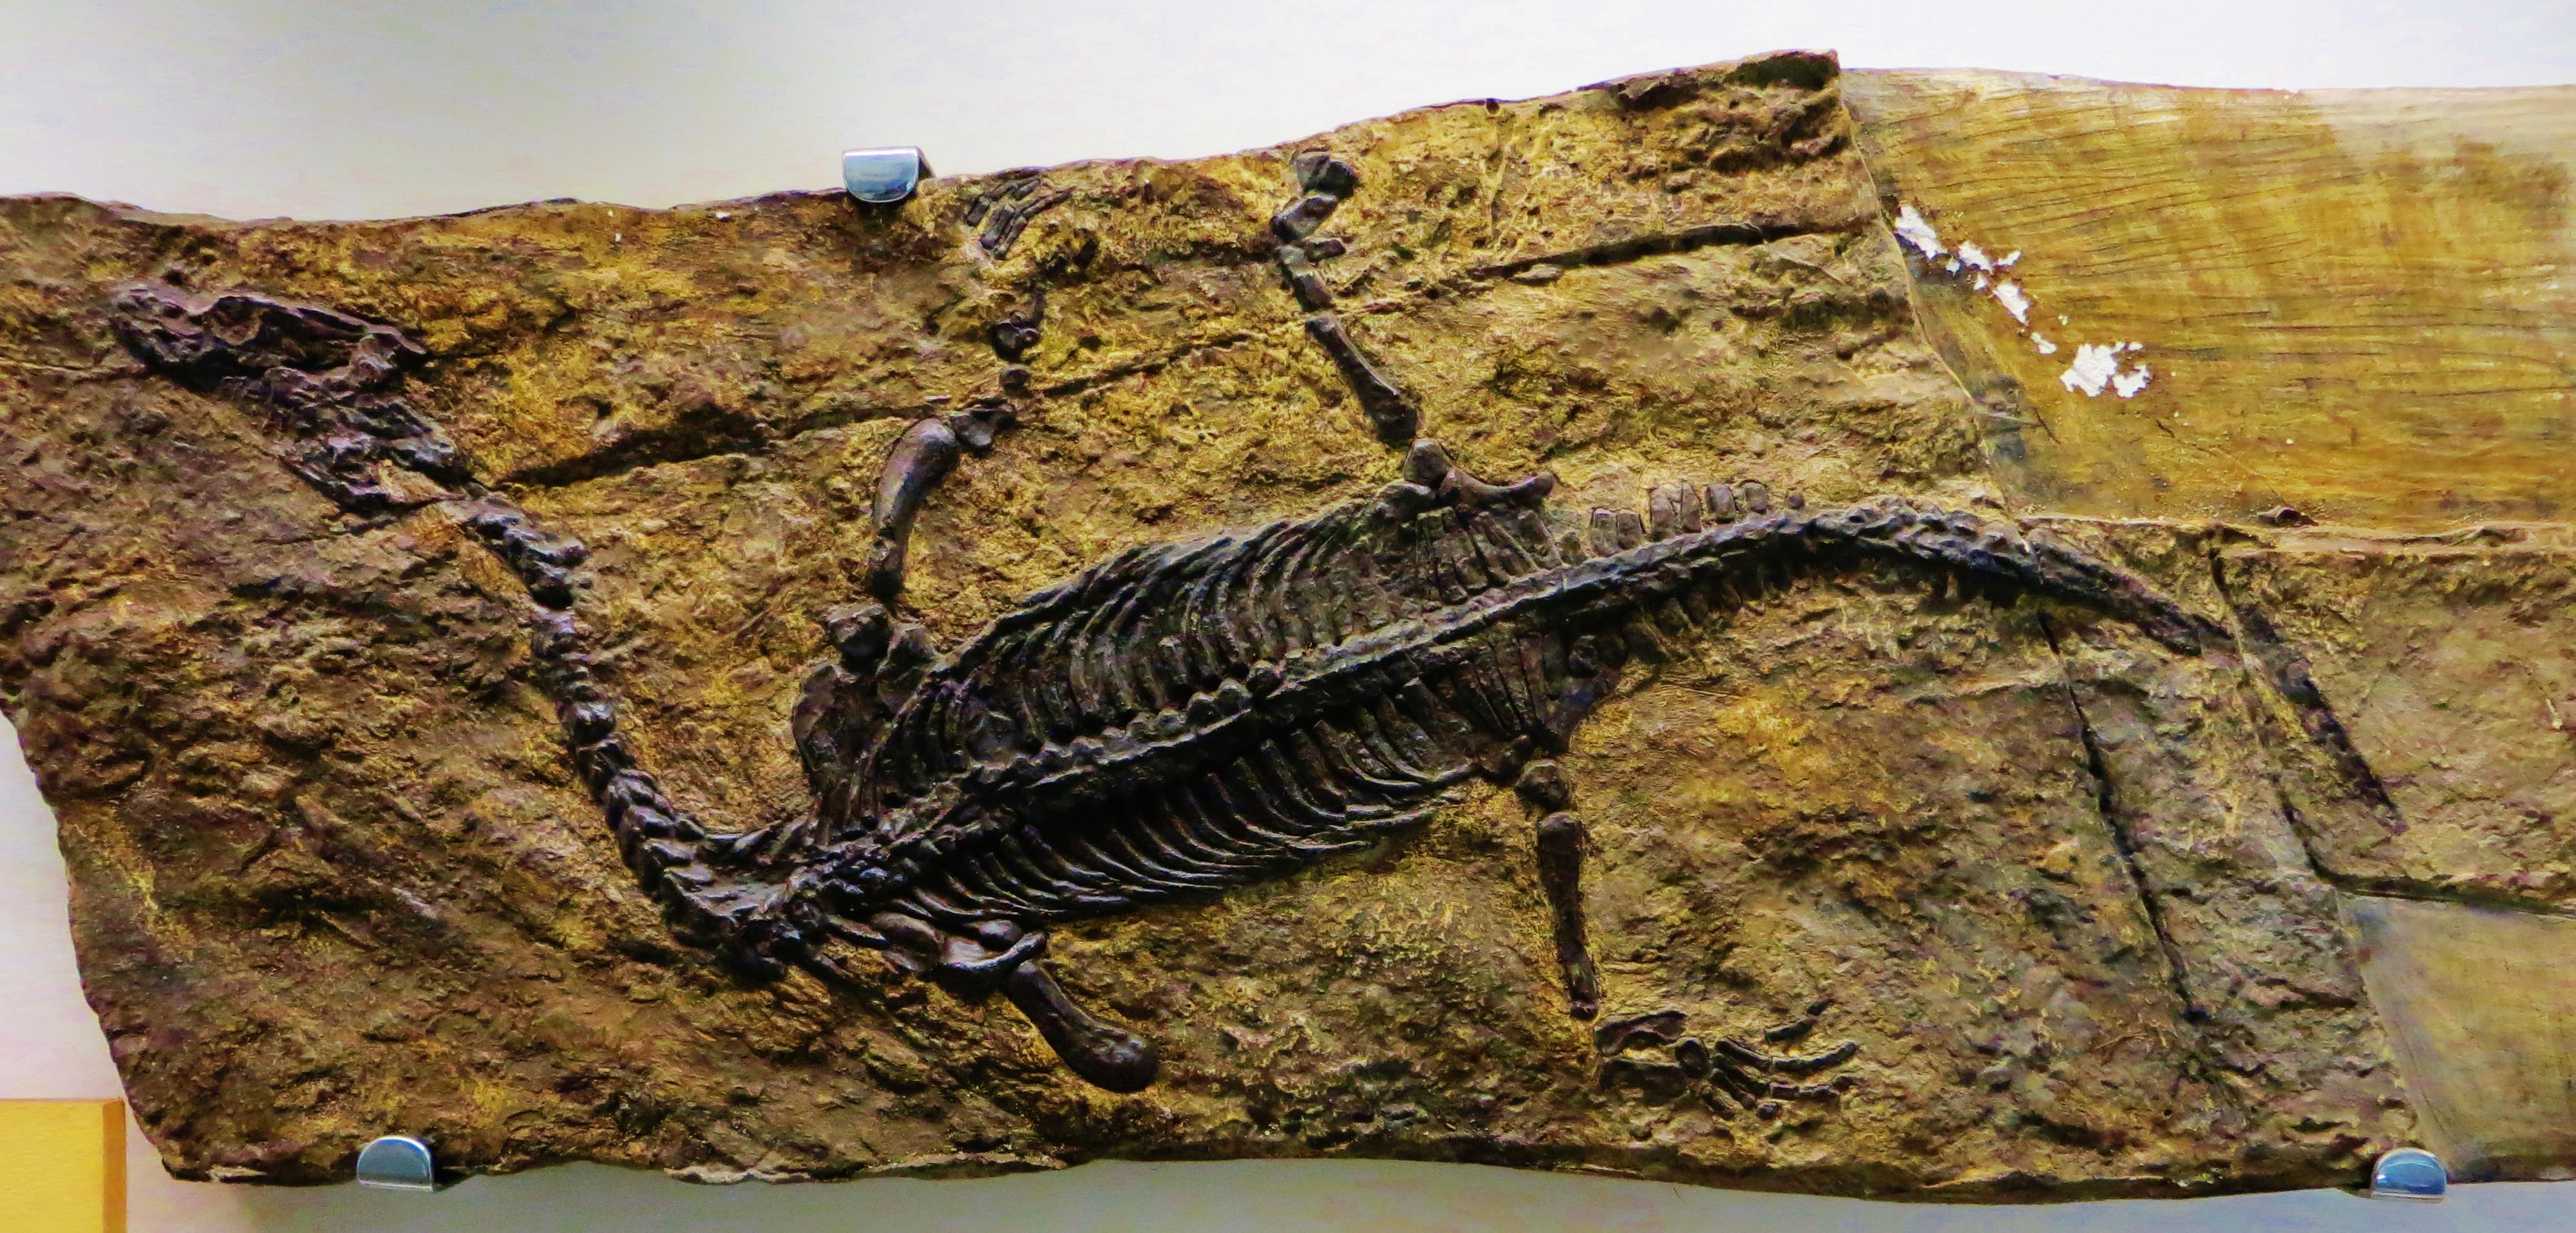 filelariosaurus balsami esino perledojpg